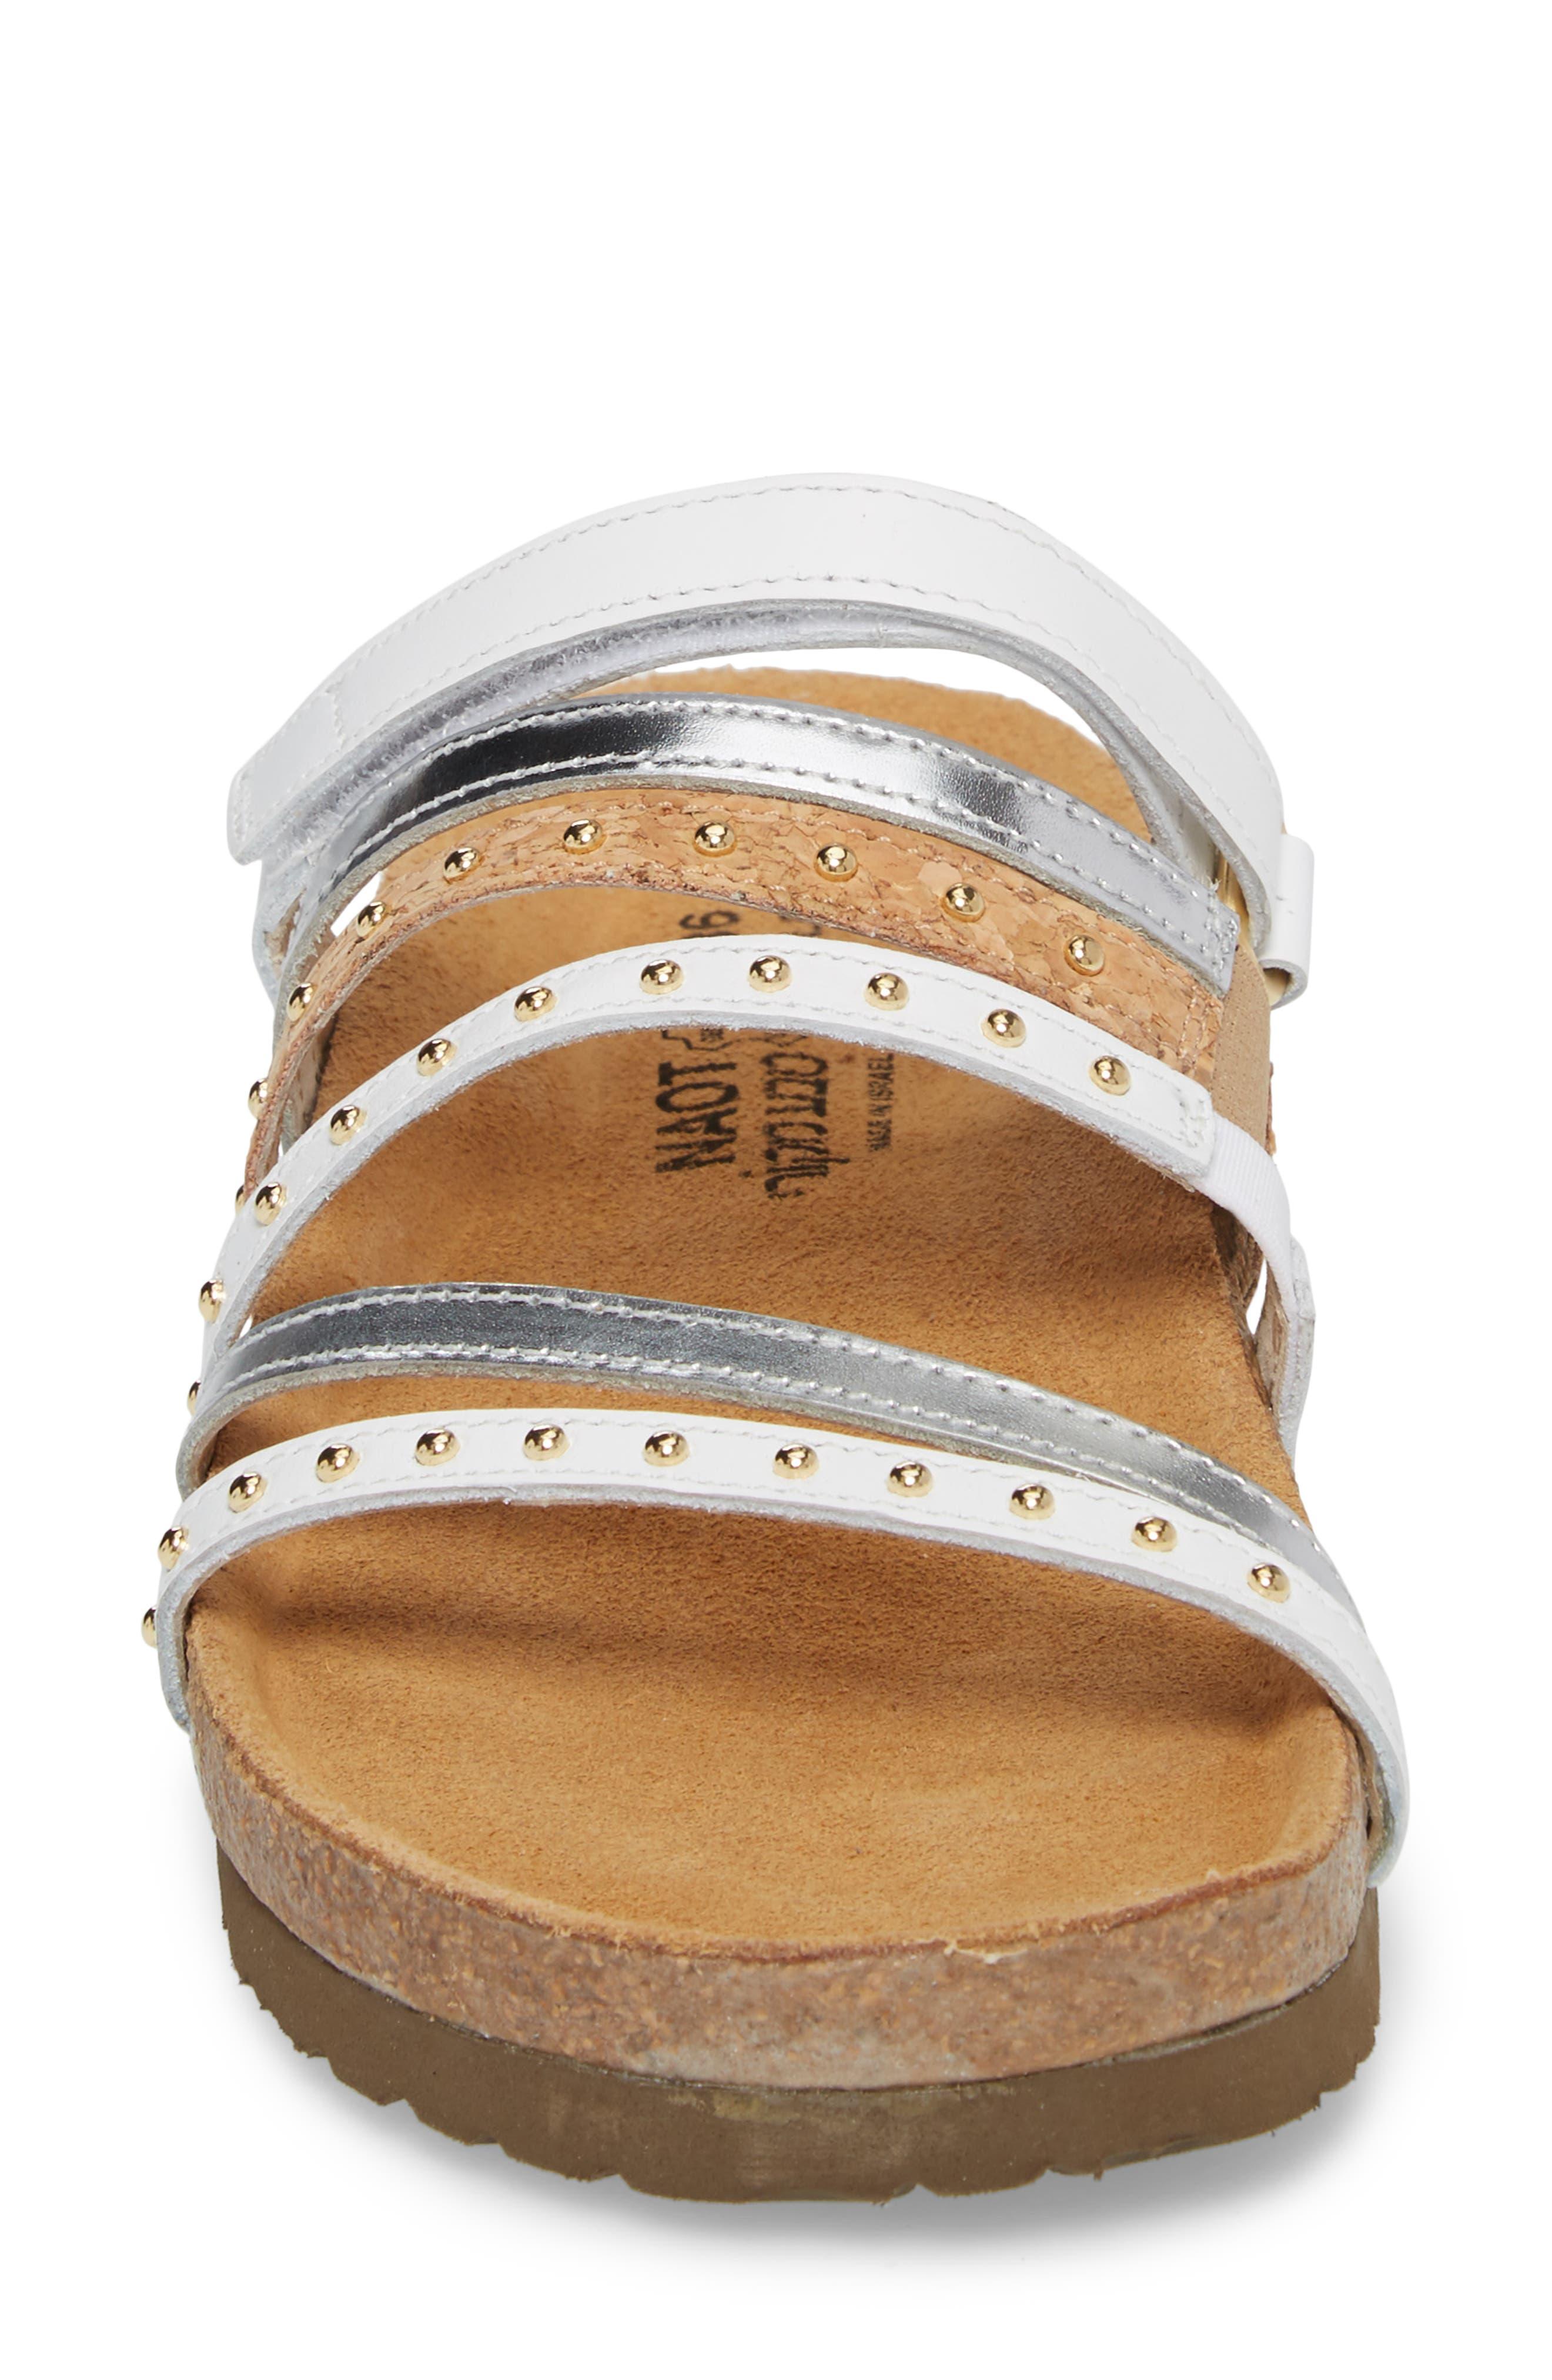 Prescott Sandal,                             Alternate thumbnail 4, color,                             White/ Silver Leather